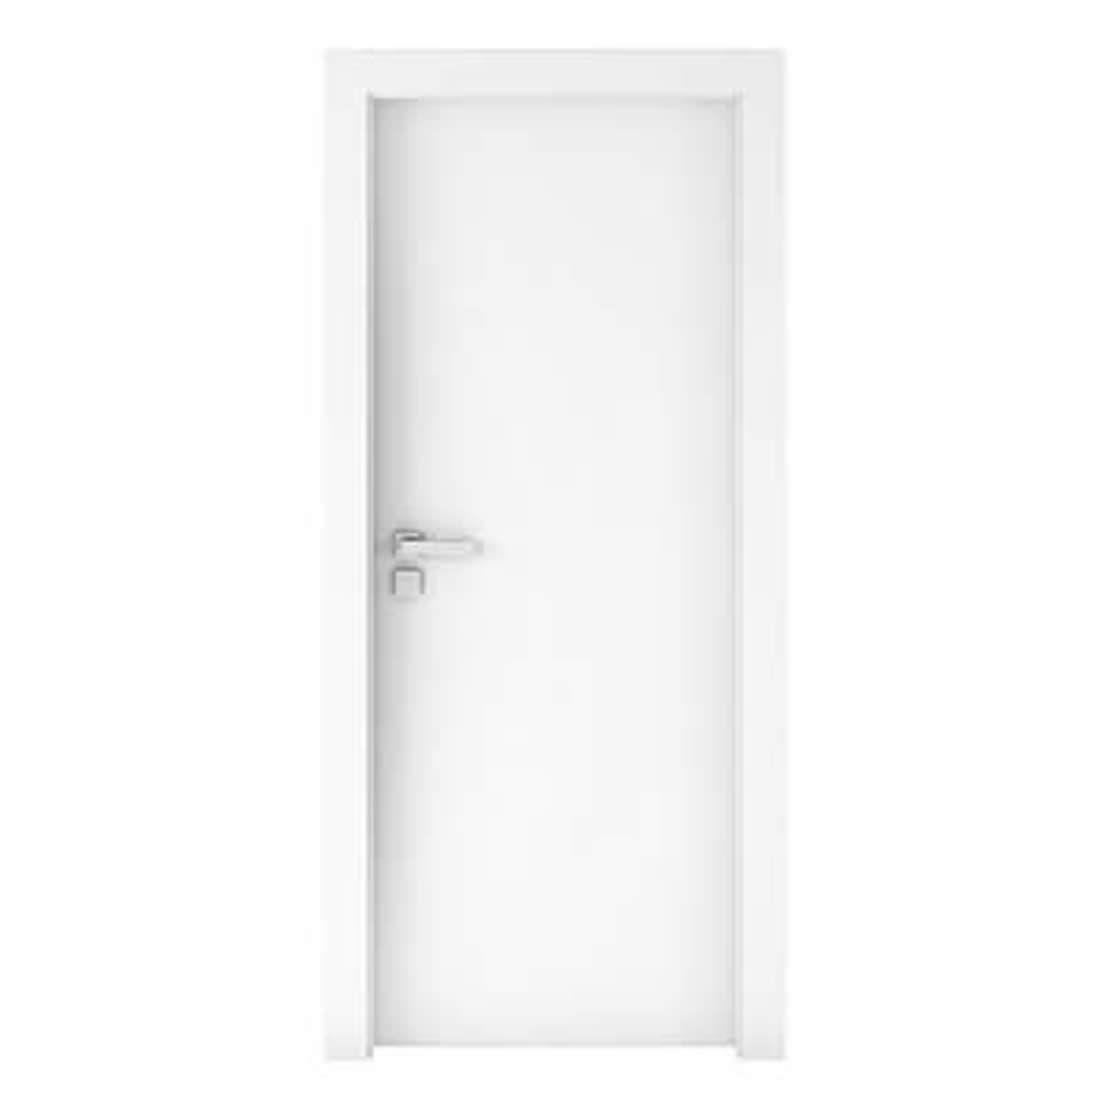 Kit Porta Concrem Wood 2,10 x 0,70 x 3,5 cm Direita Branca